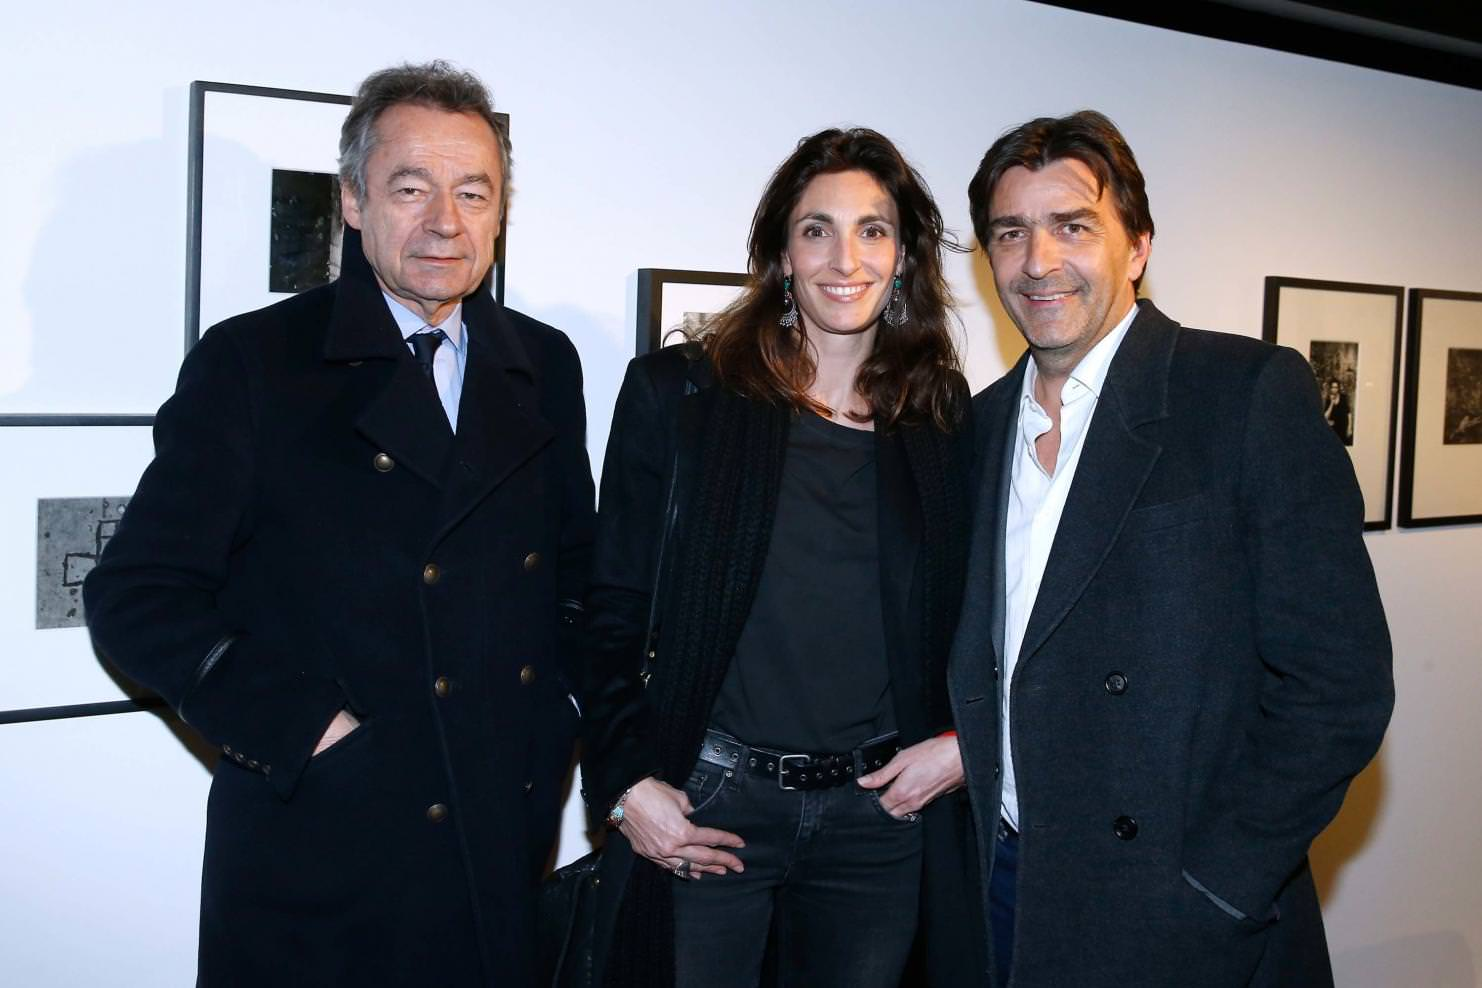 Michel Denisot, Laurence Alleno, Yannick Alleno